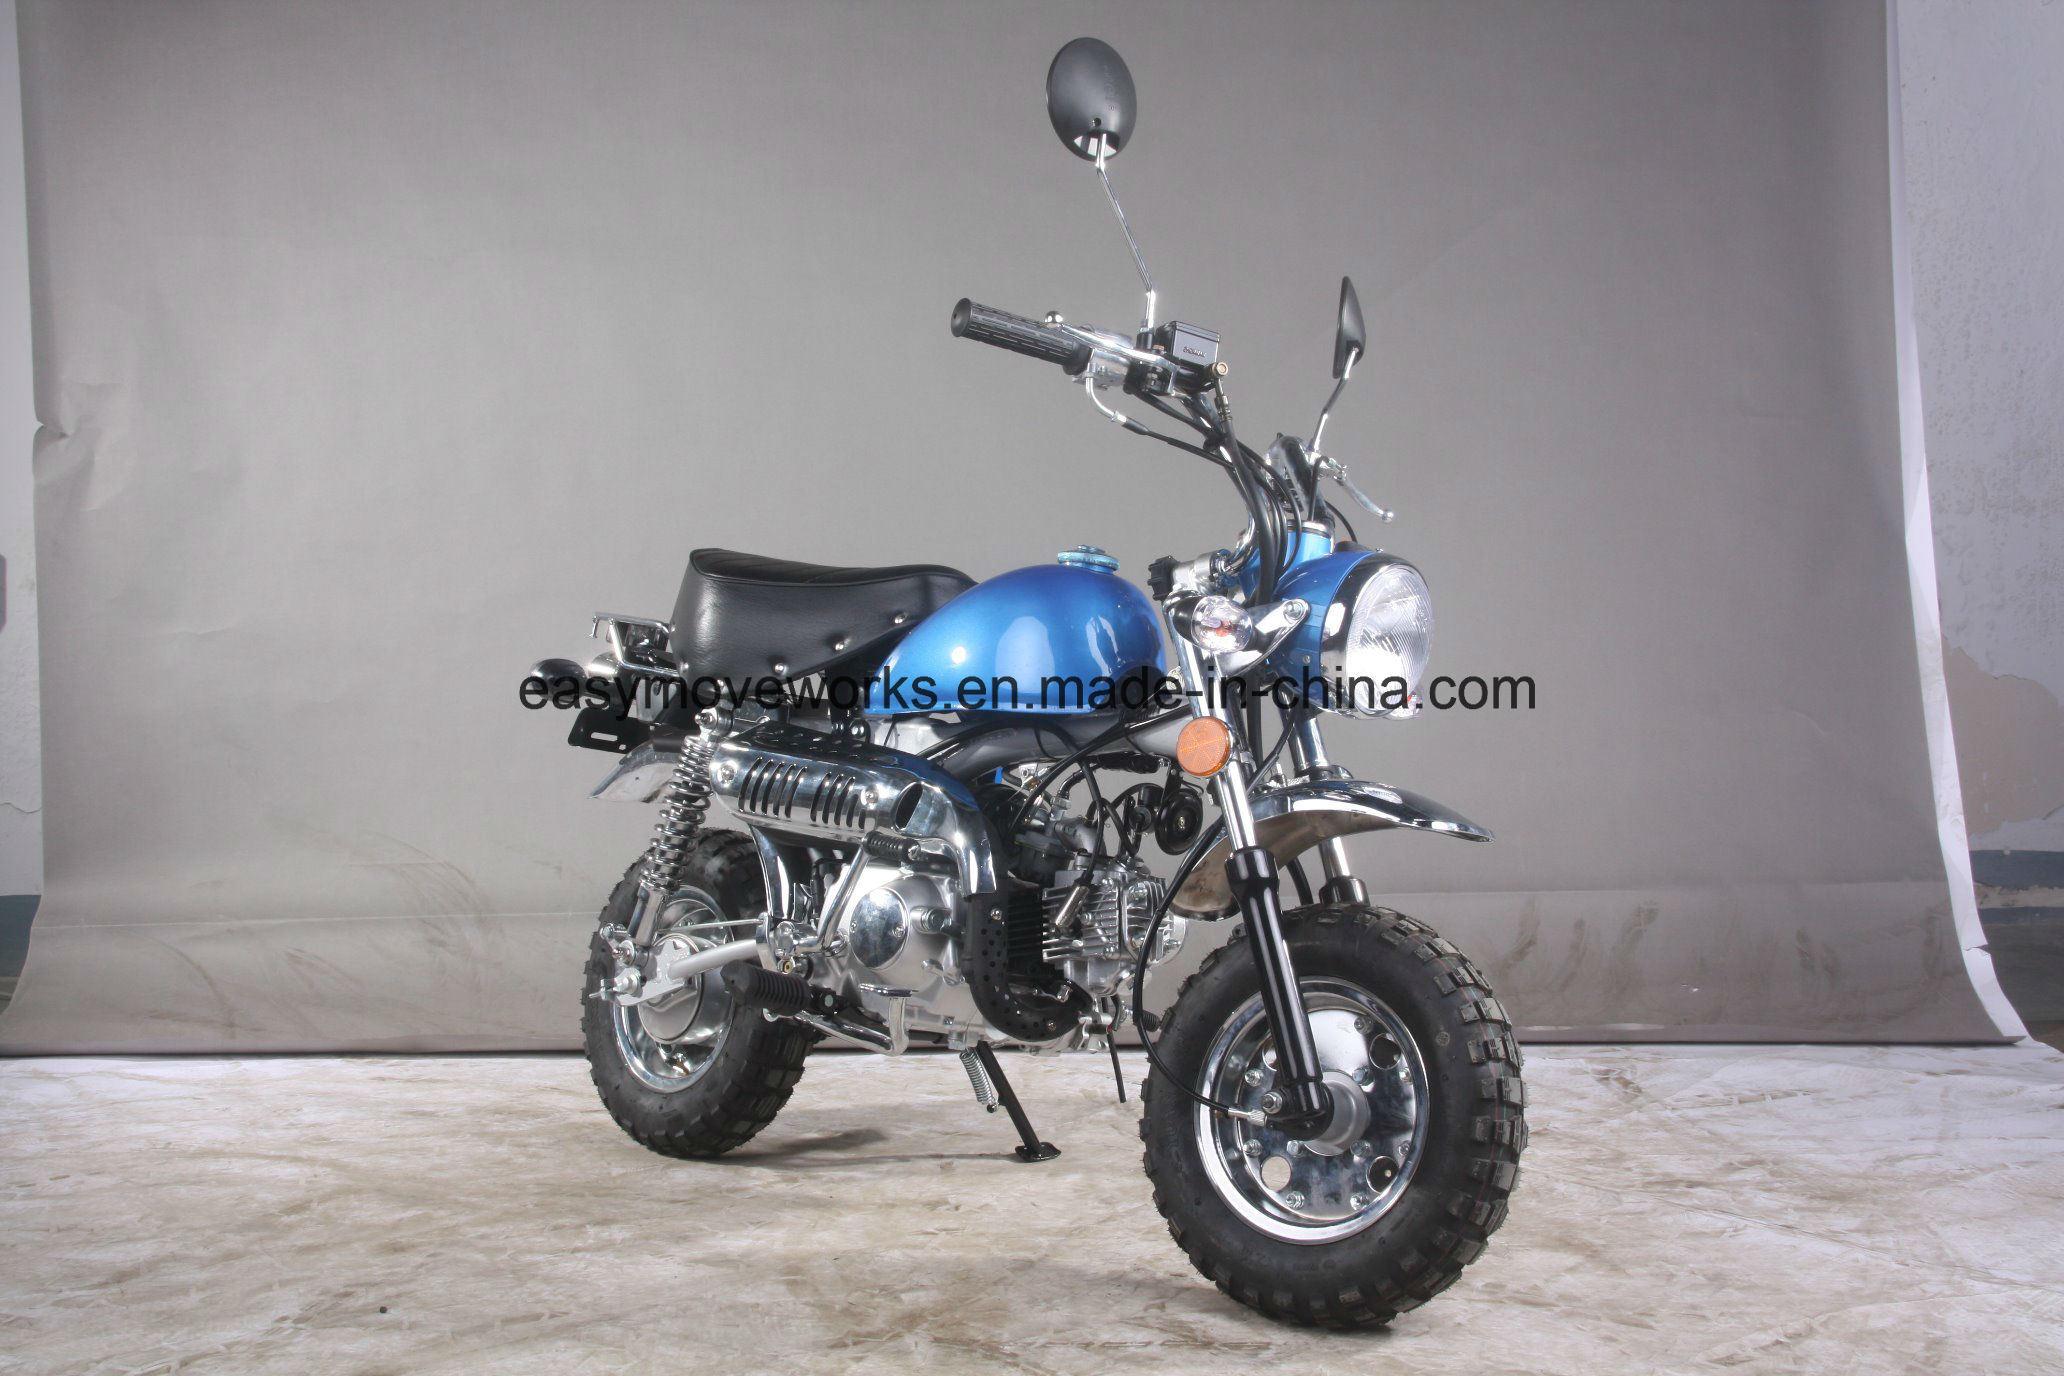 Zhenhua Classic Motorcycle Monkey Bike 50cc Euro4 Efi